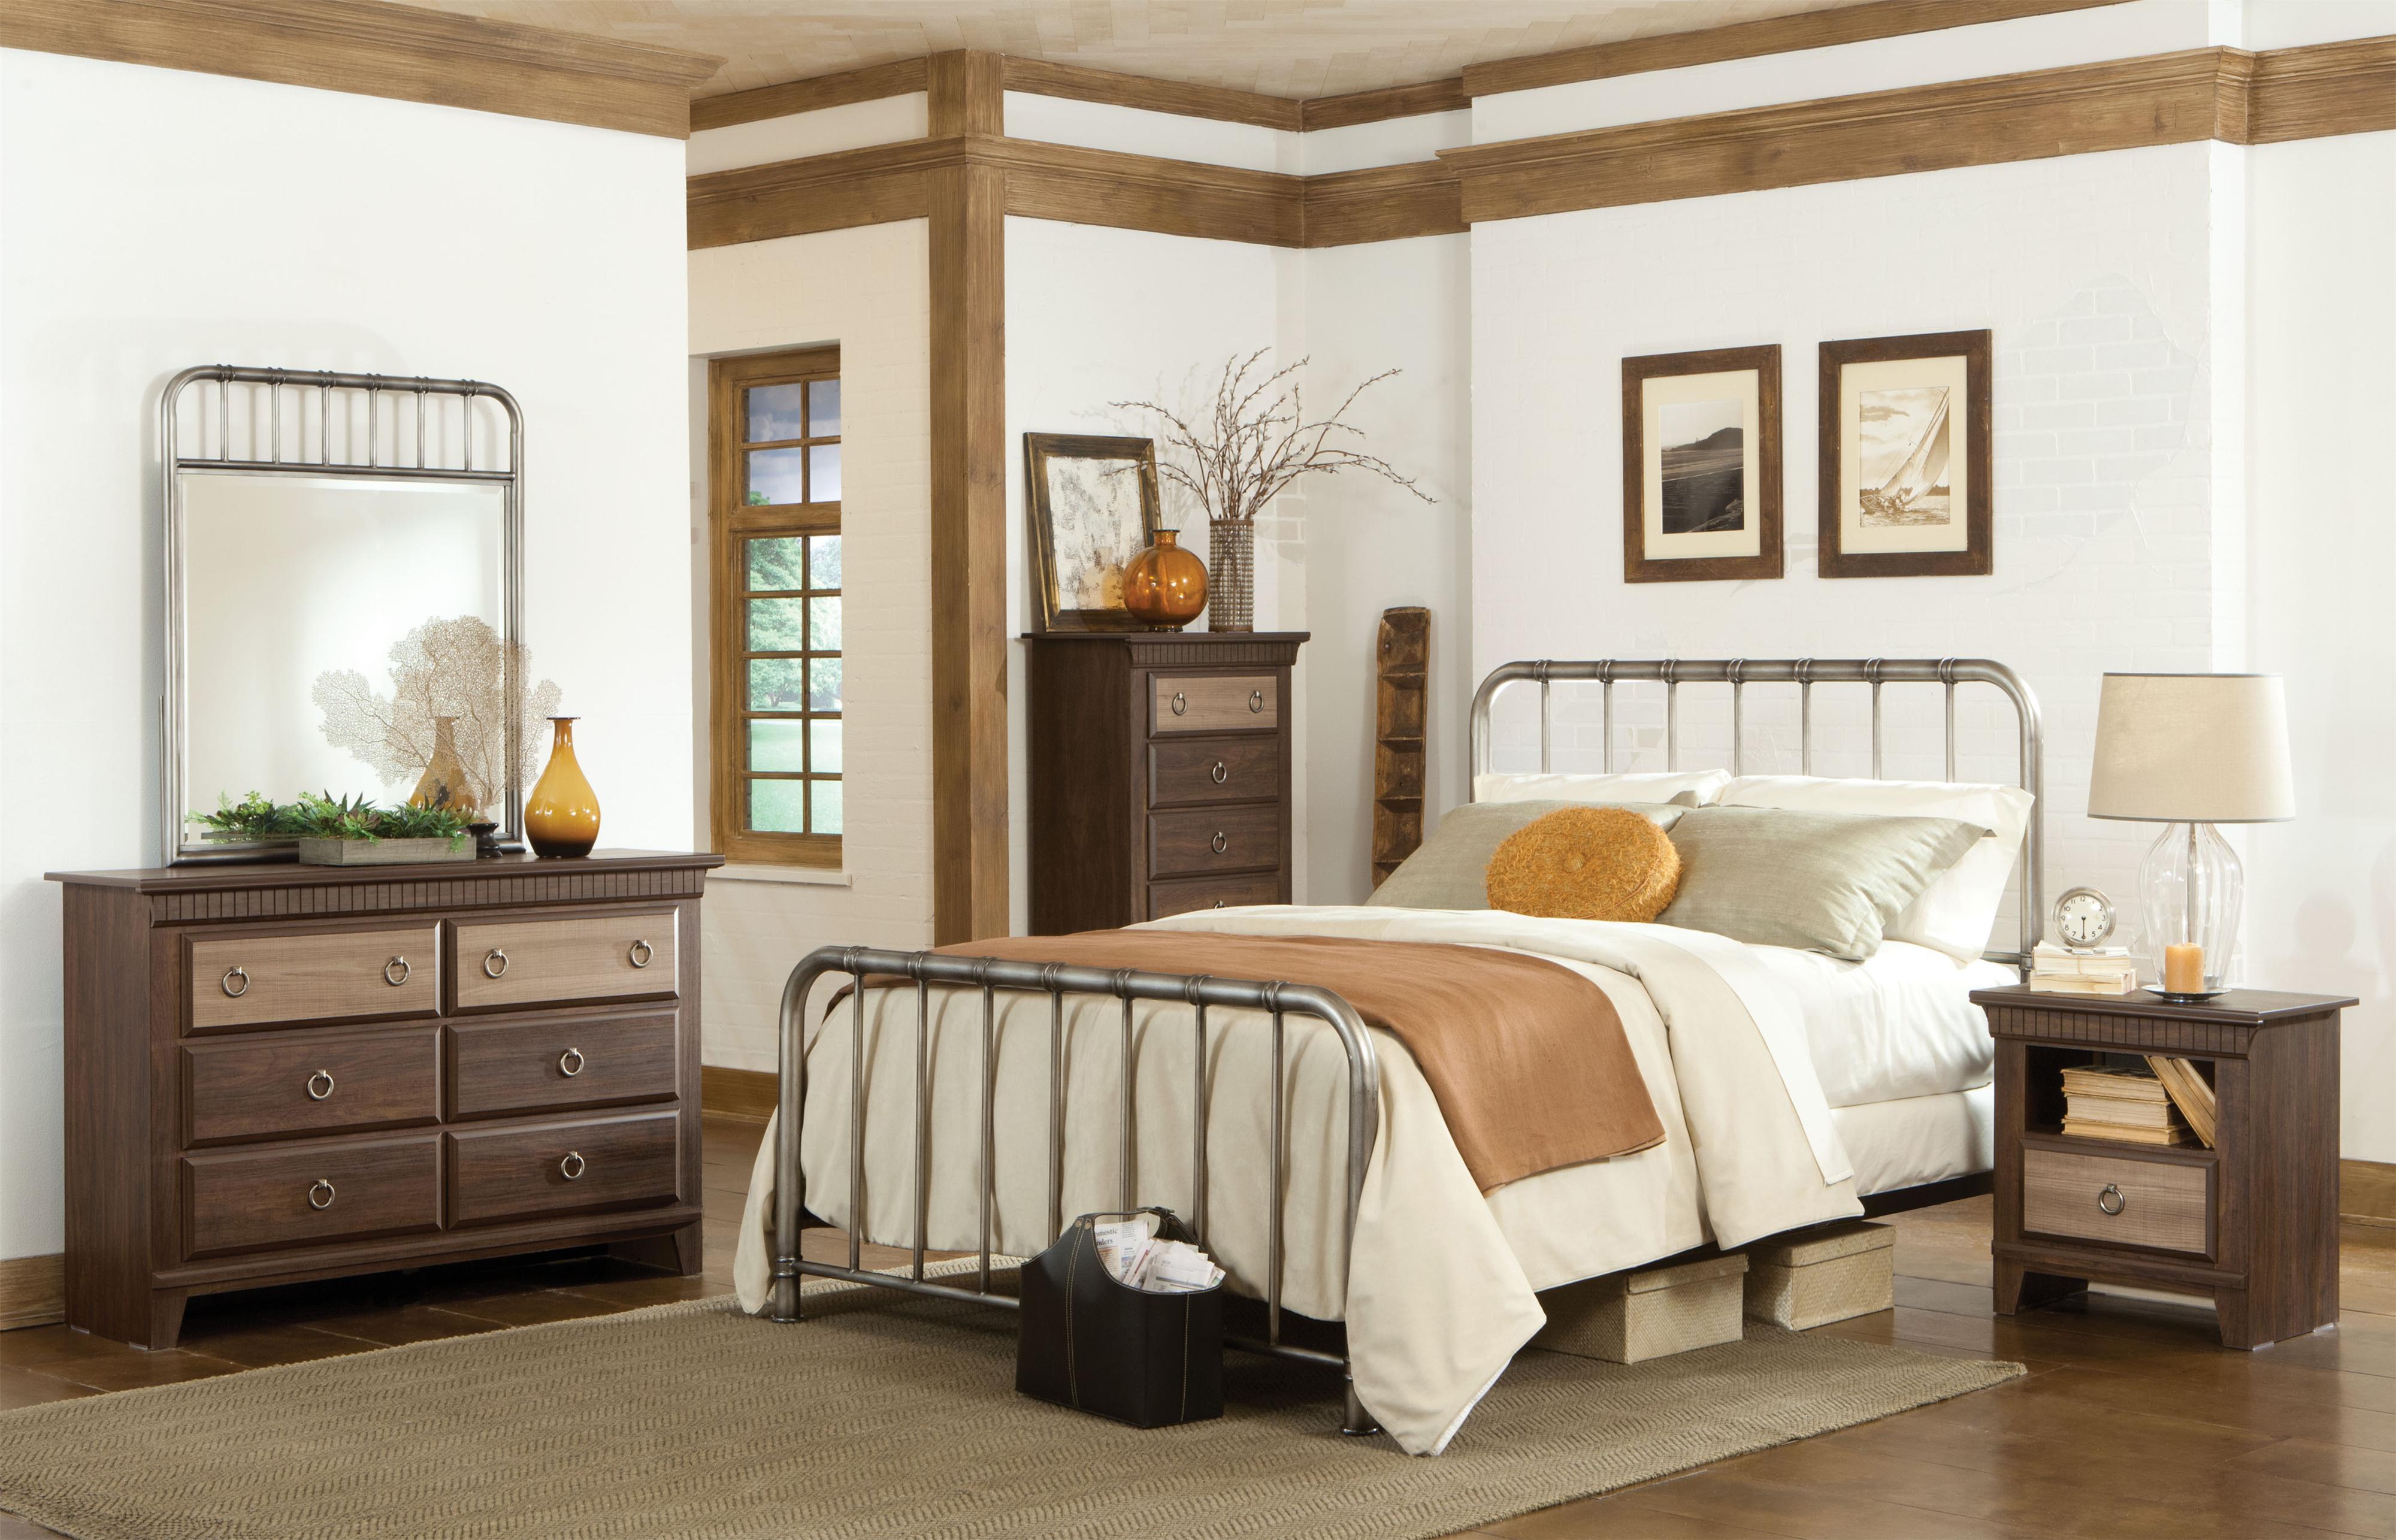 Delightful Standard Furniture Tristen Queen Metal Bed With Tubular Steel   Wayside  Furniture   Headboard U0026 Footboard